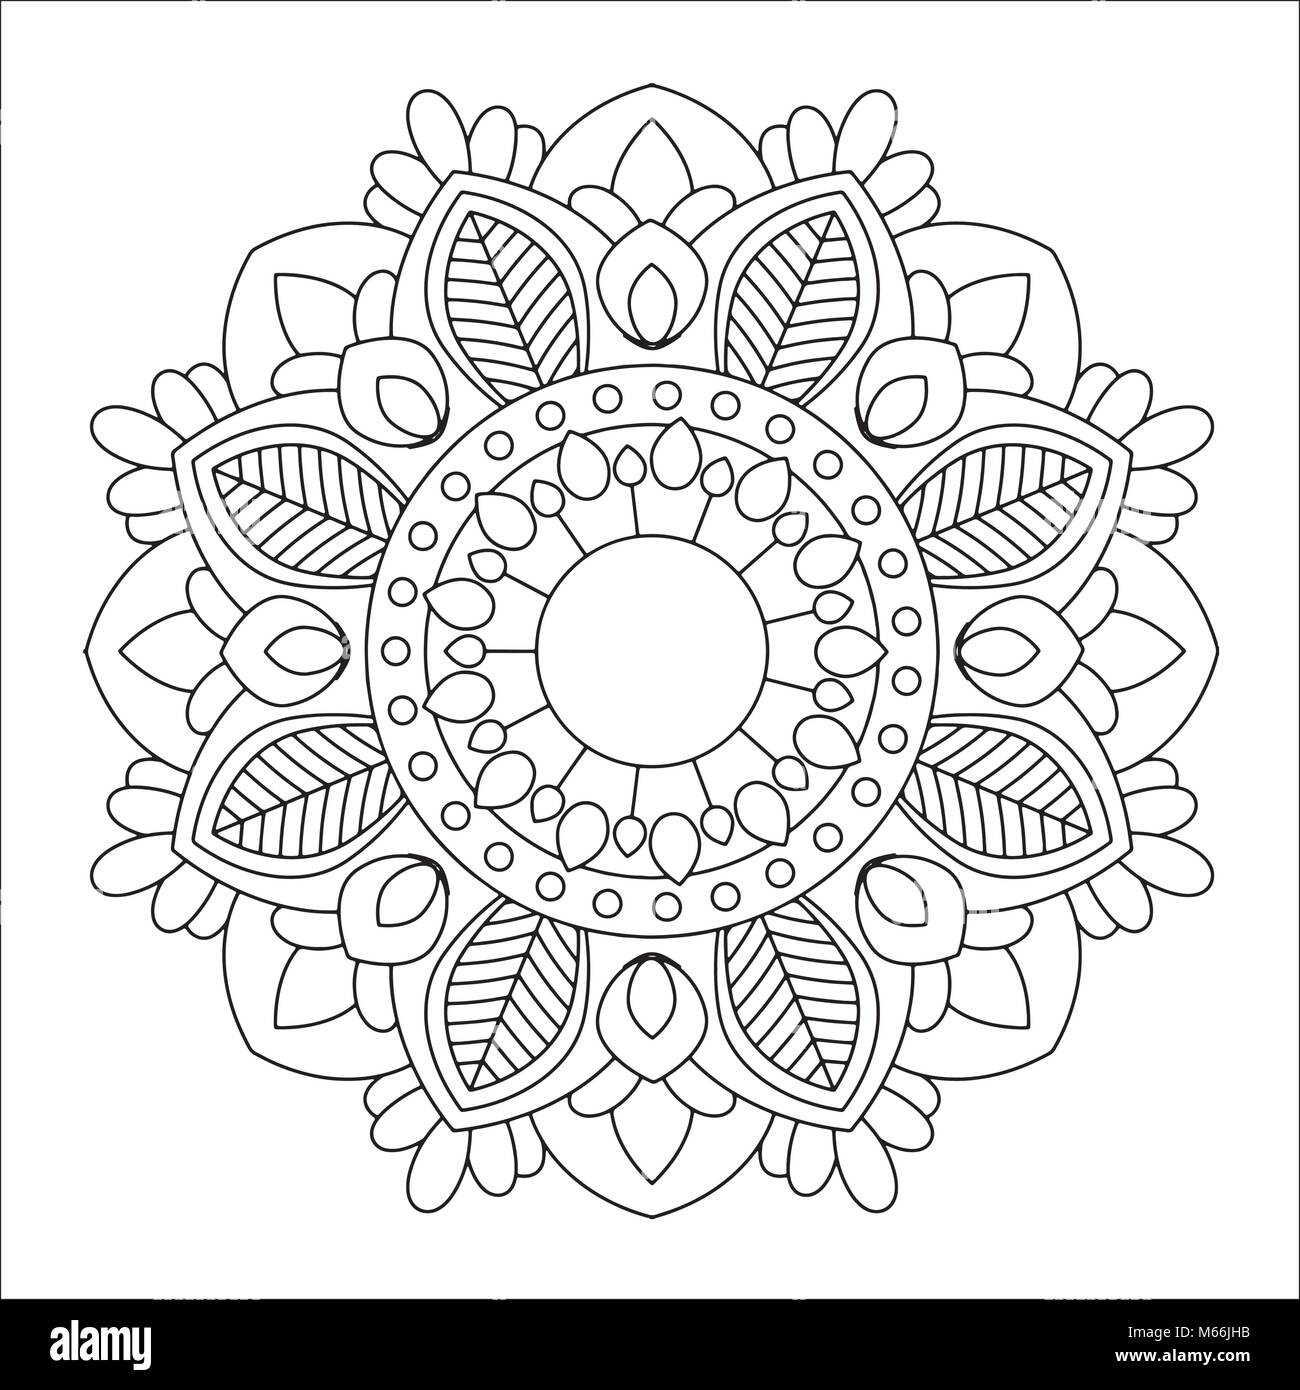 Blume Mandala Vector Illustration Vektor Abbildung - Bild: 175937927 ...